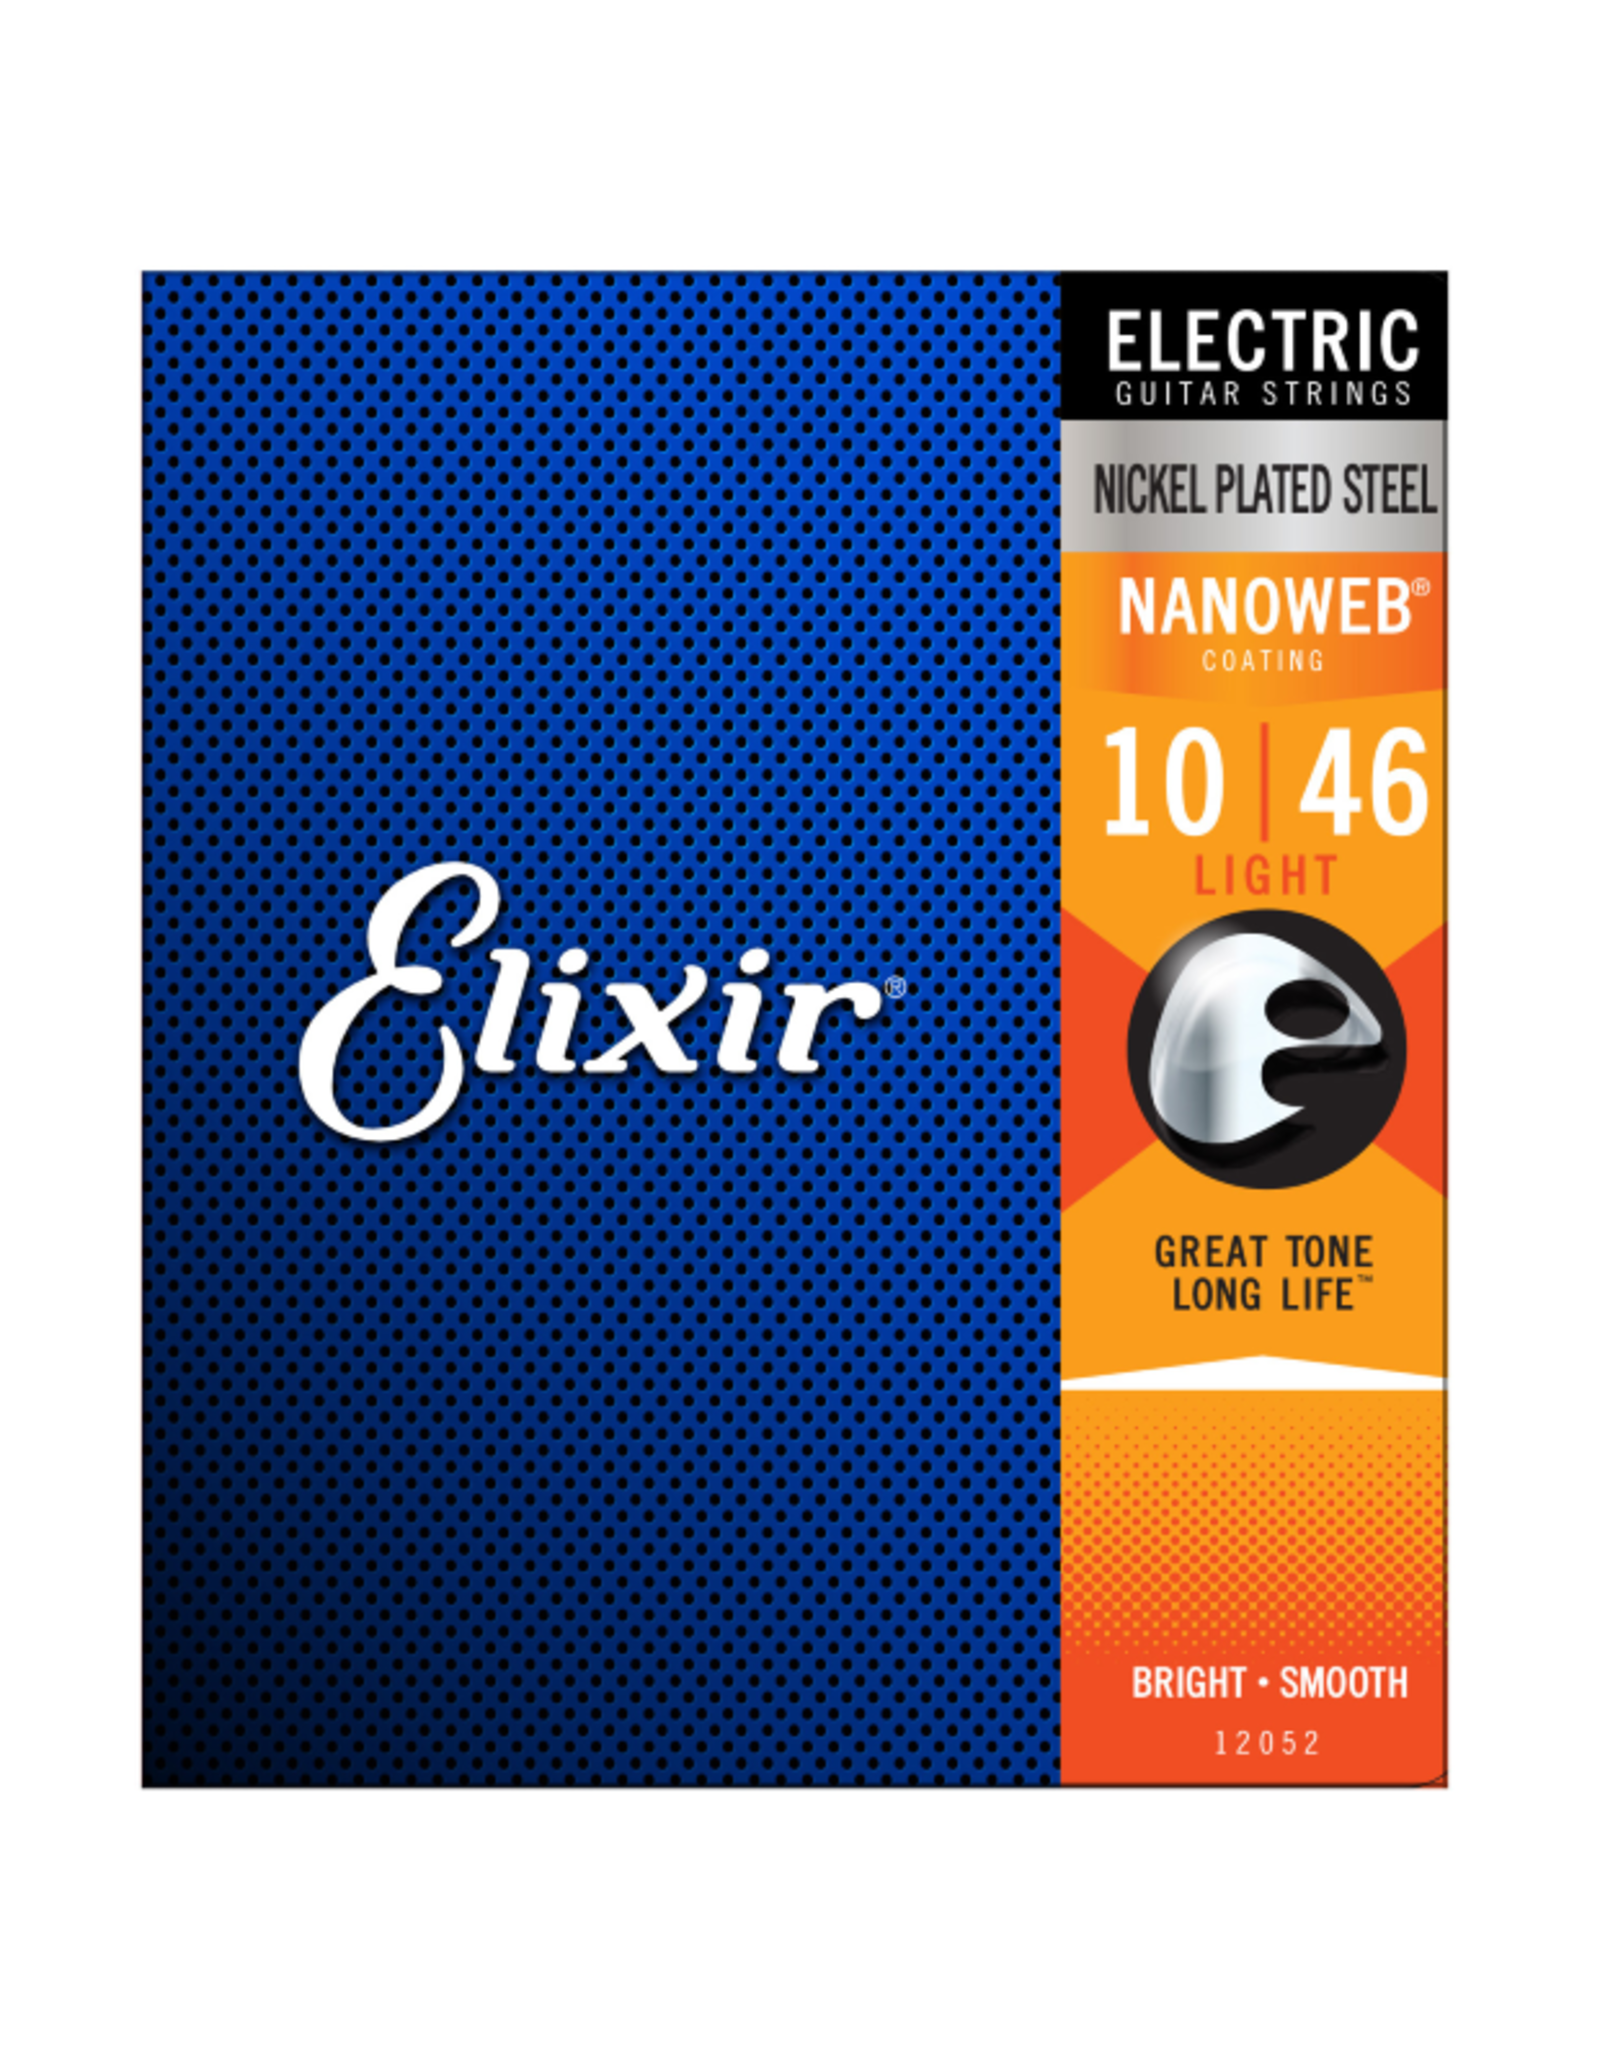 Elixir Elixir 12052 Nickel Plated Steel Electric Guitar Strings with NANOWEB Light 10-46